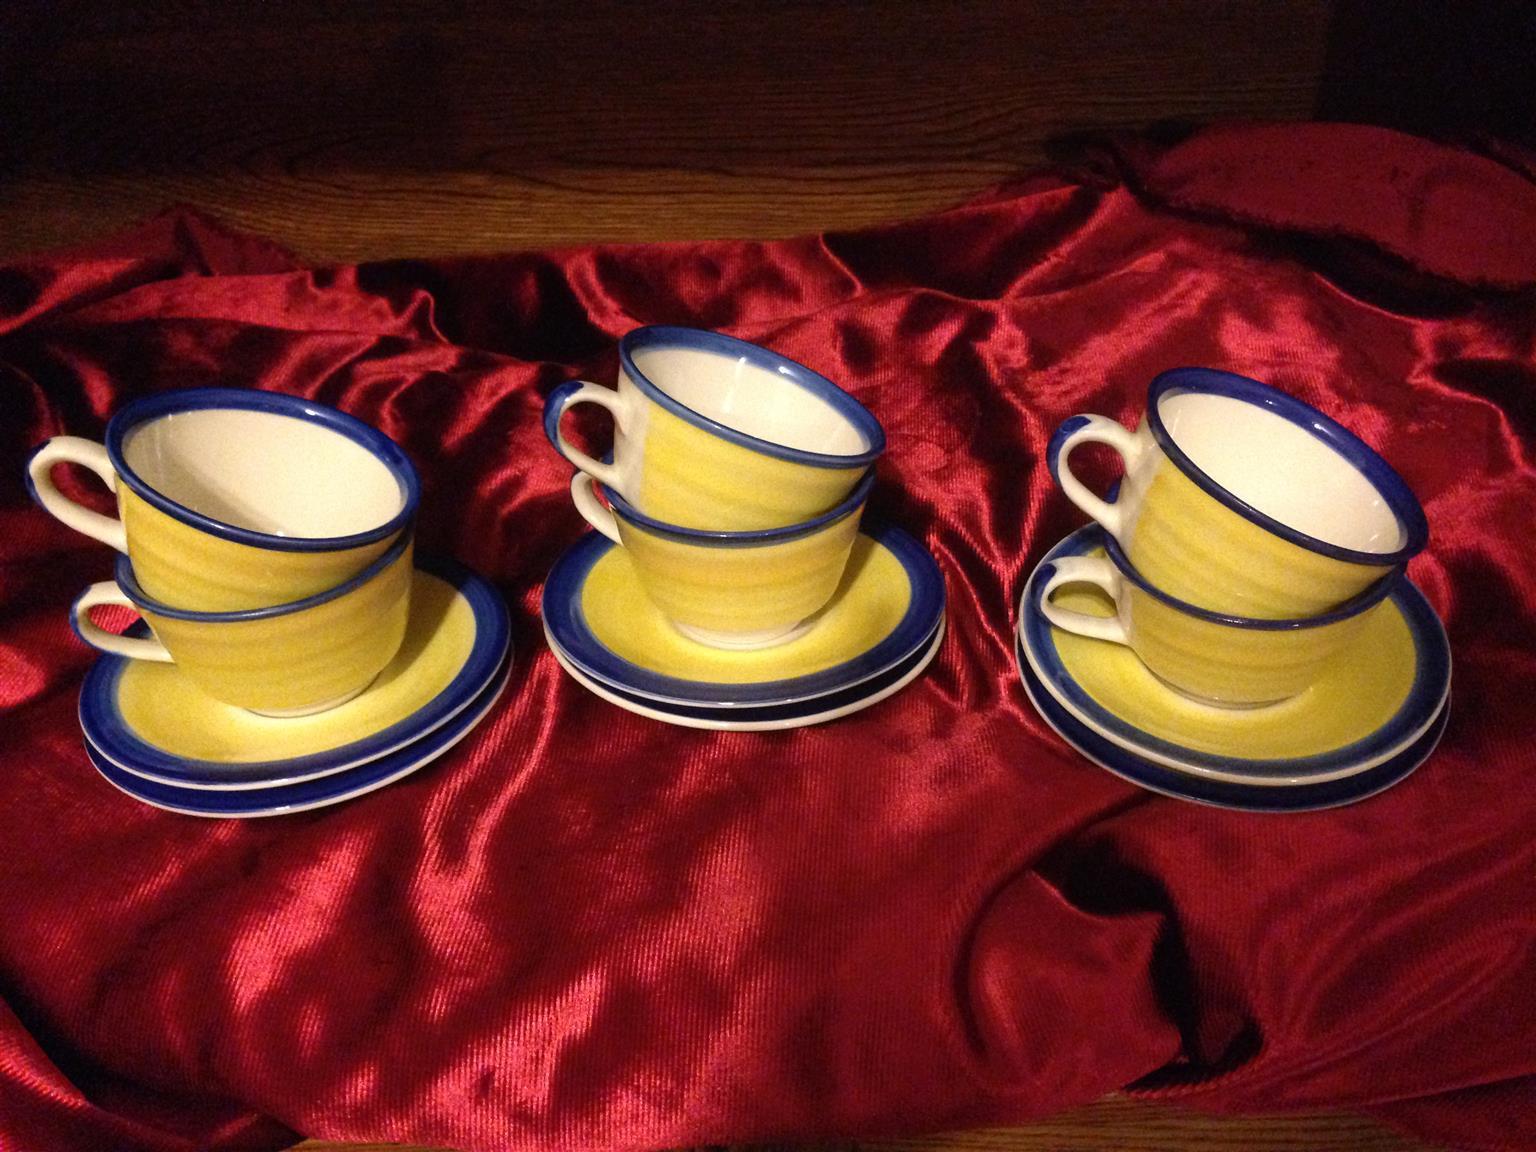 Beautiful Blue Tea Set + 6 Petite Yellow Cups and Saucers